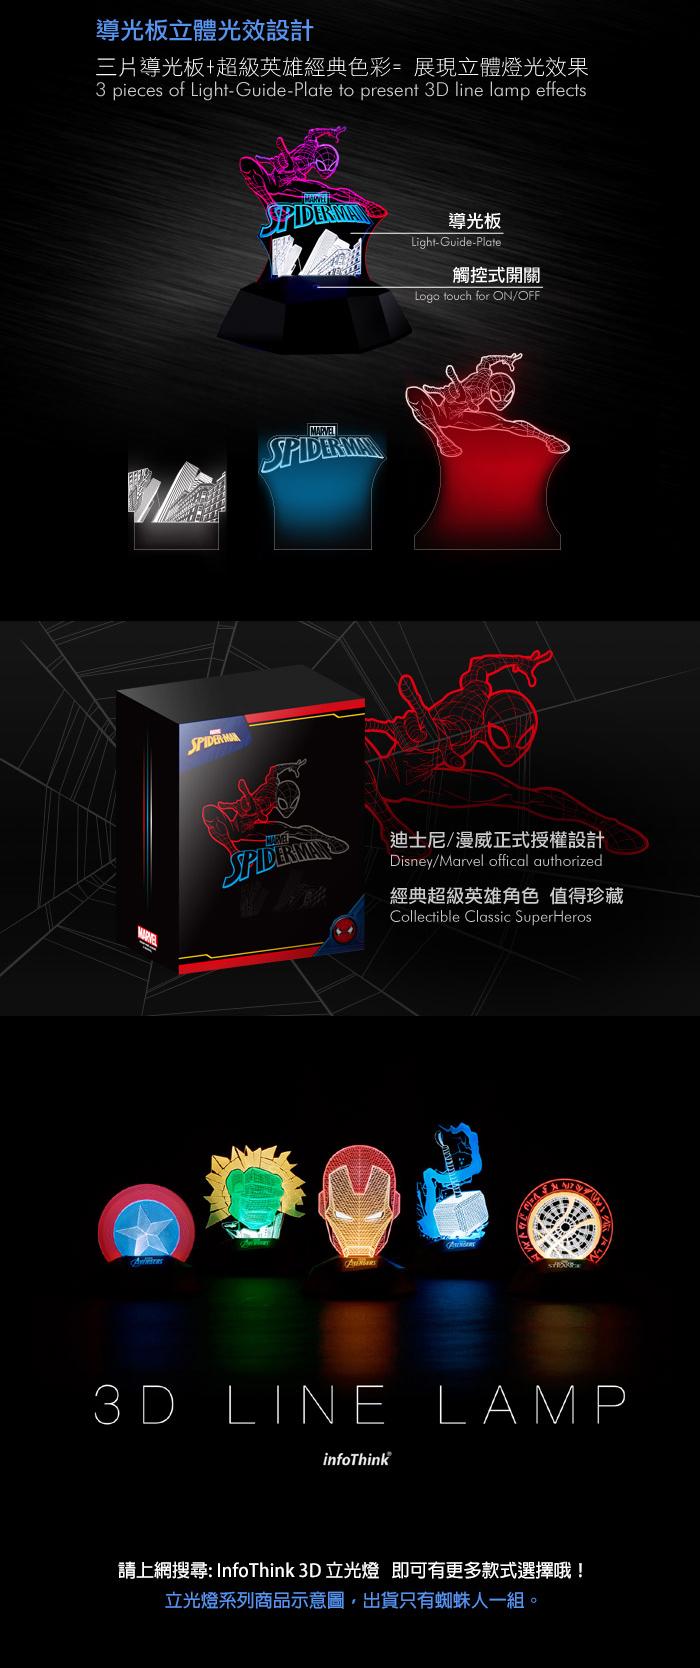 InfoThink|蜘蛛人3D立光燈